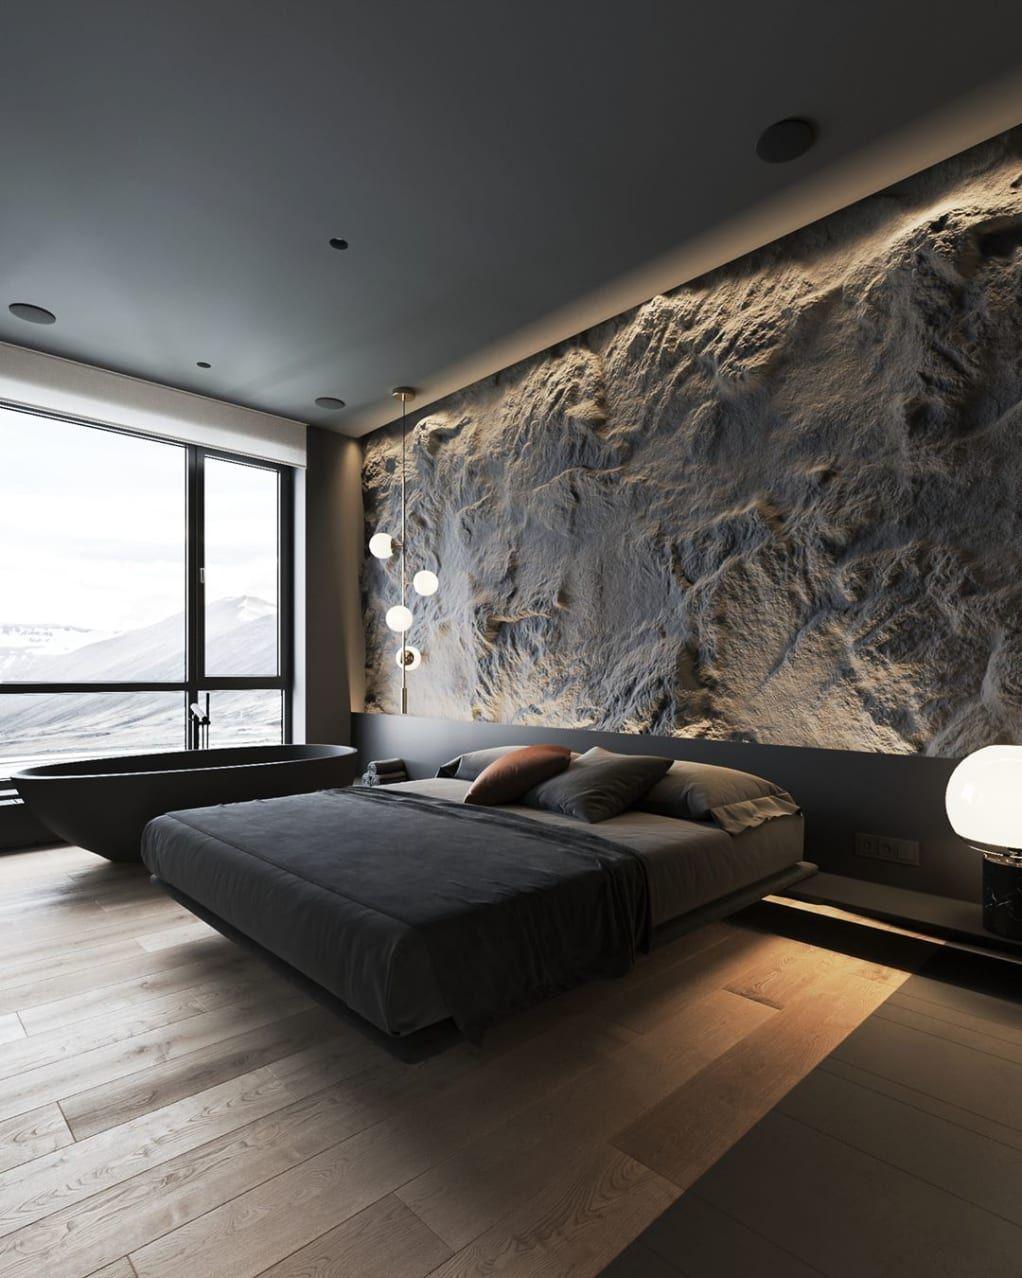 Minimal Interior Design Inspiration 202 Minimalism Interior Minimal Interior Design Modern Bedroom Design Bedroom interior design inspiration